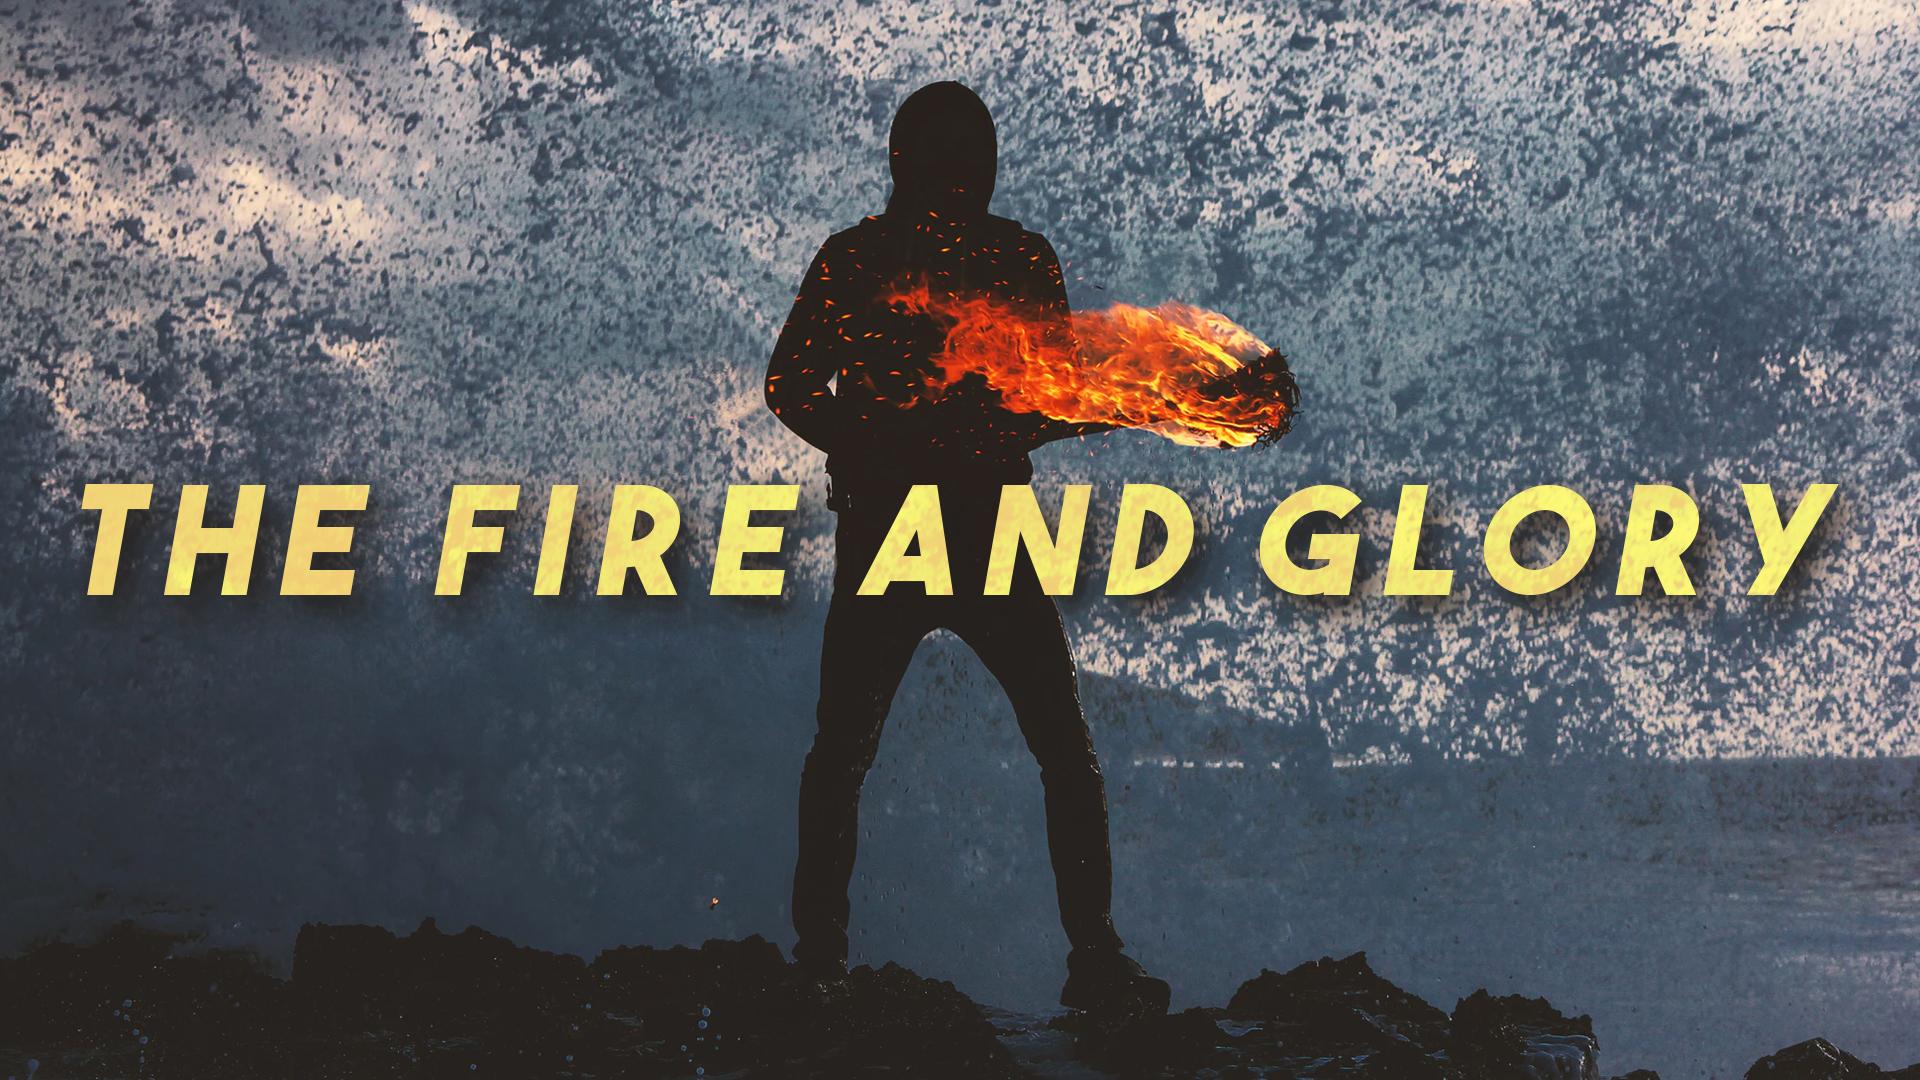 The Fire and Glory — Landmark Church